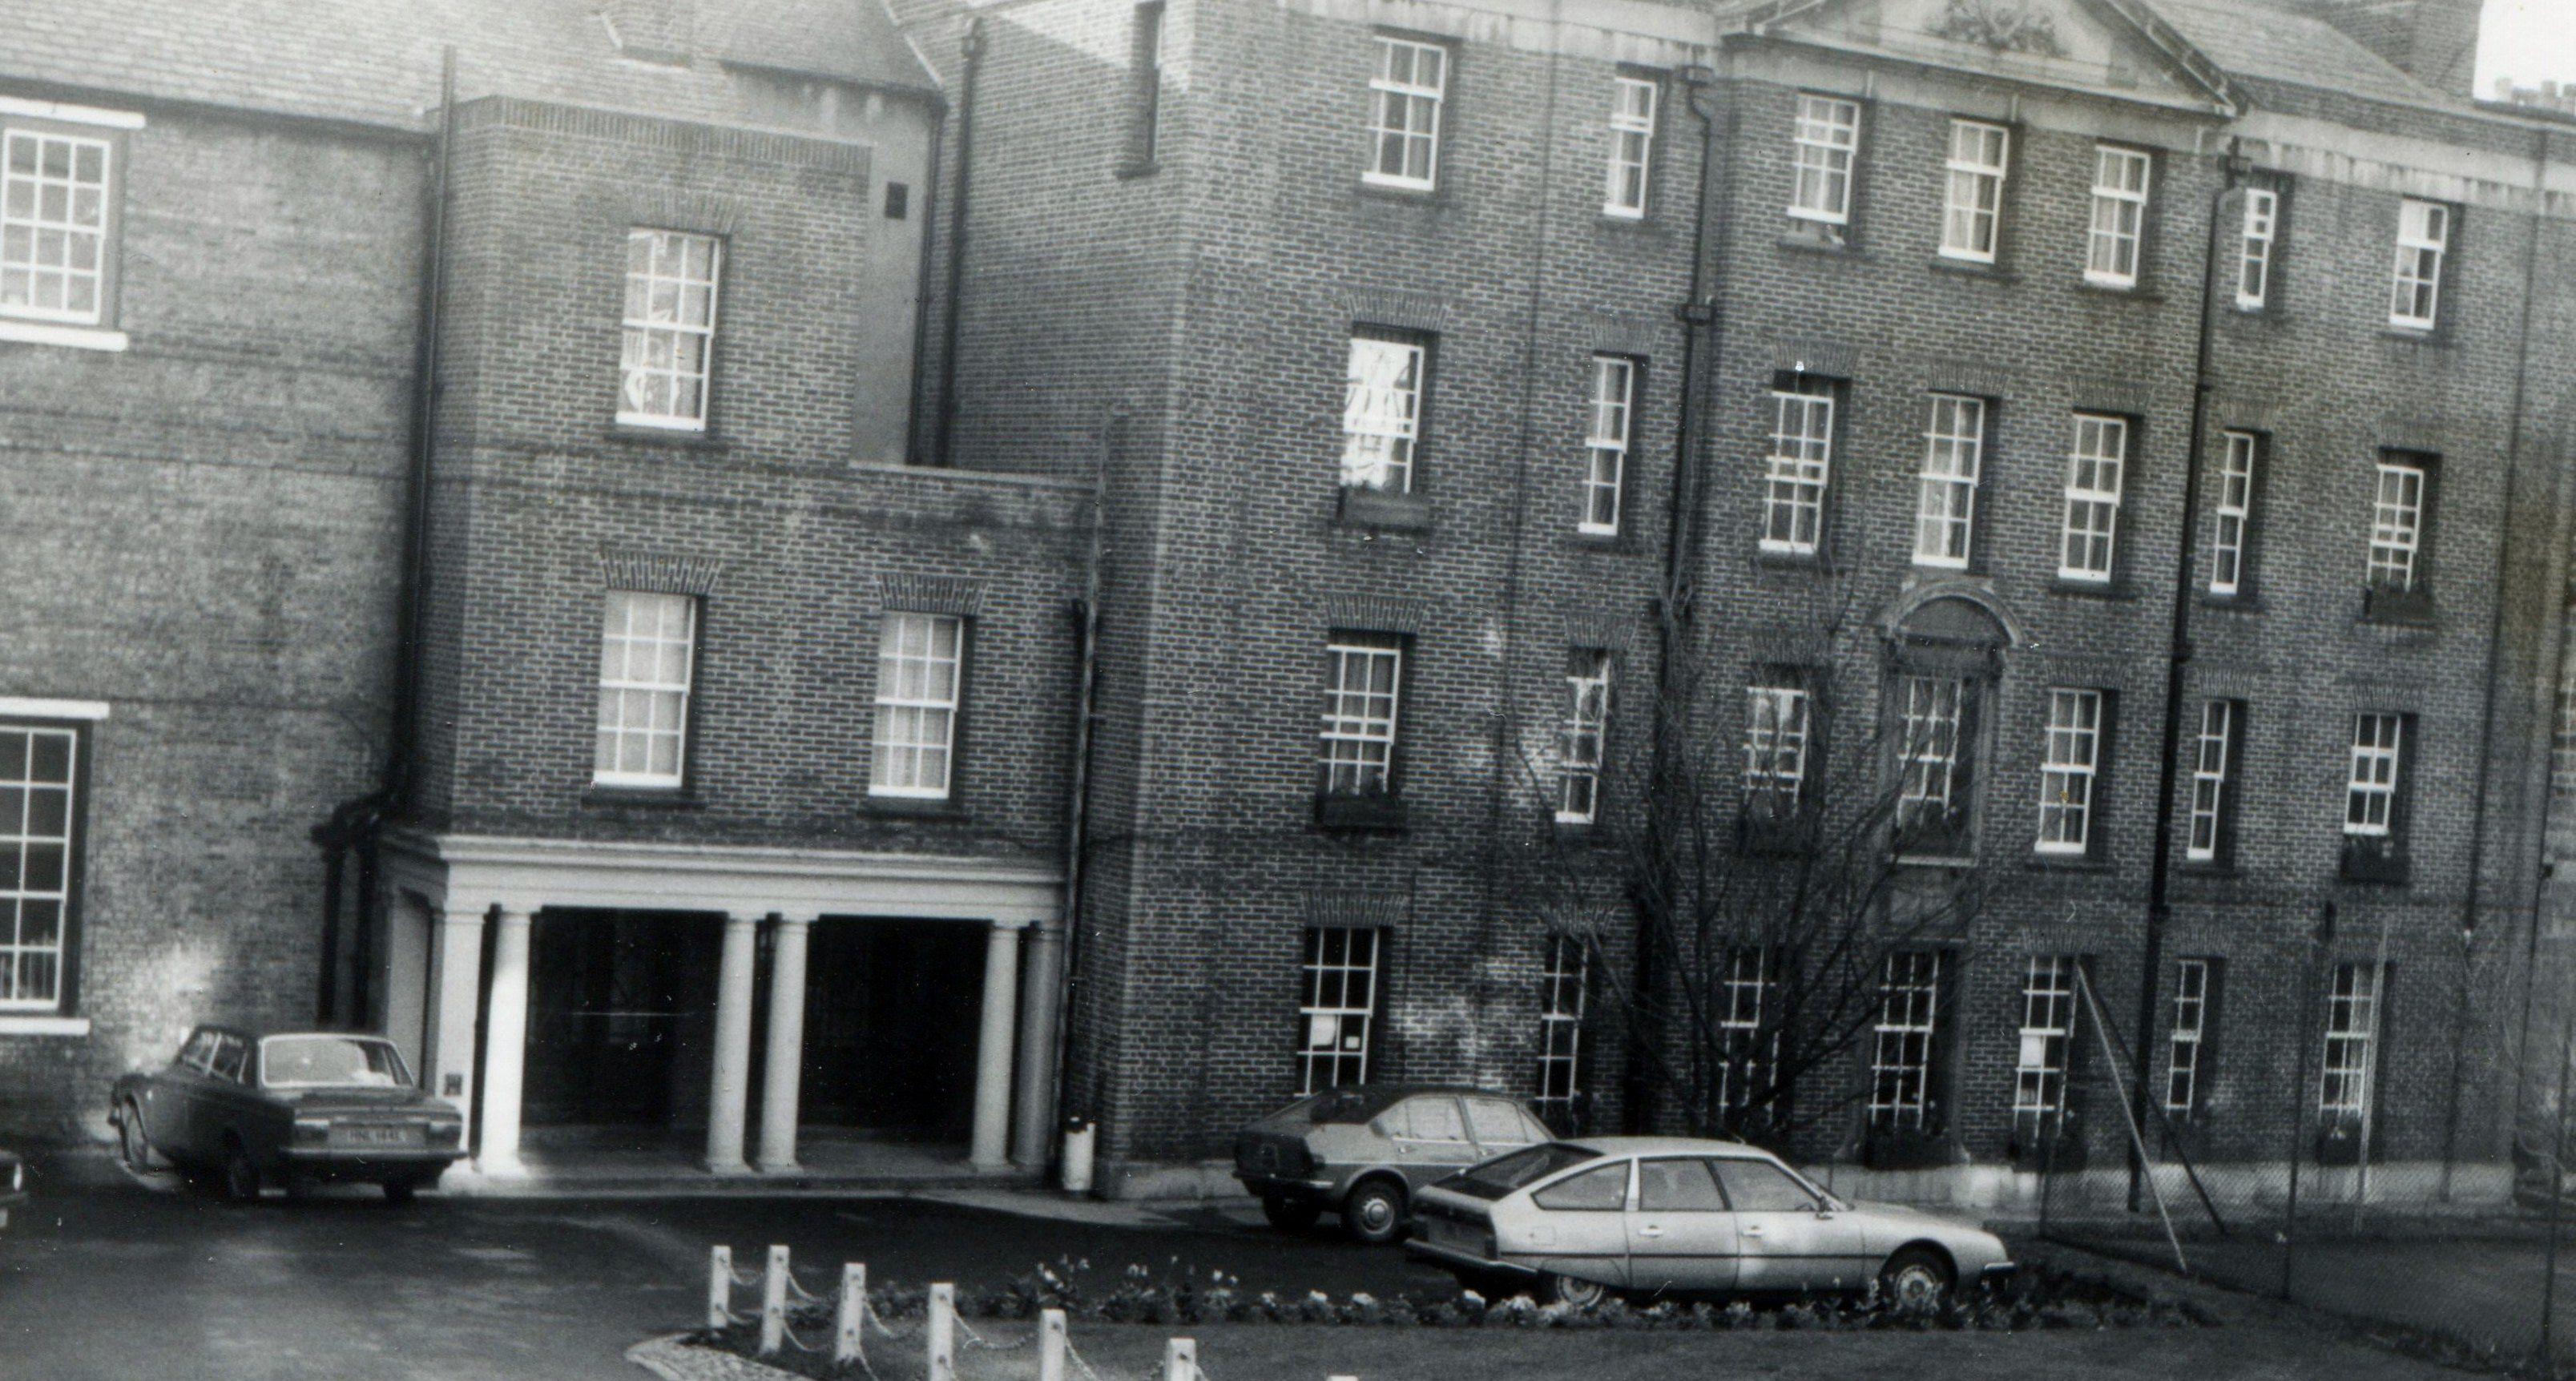 Entrance To Hatfield College Durham University 1980 Durham Uk